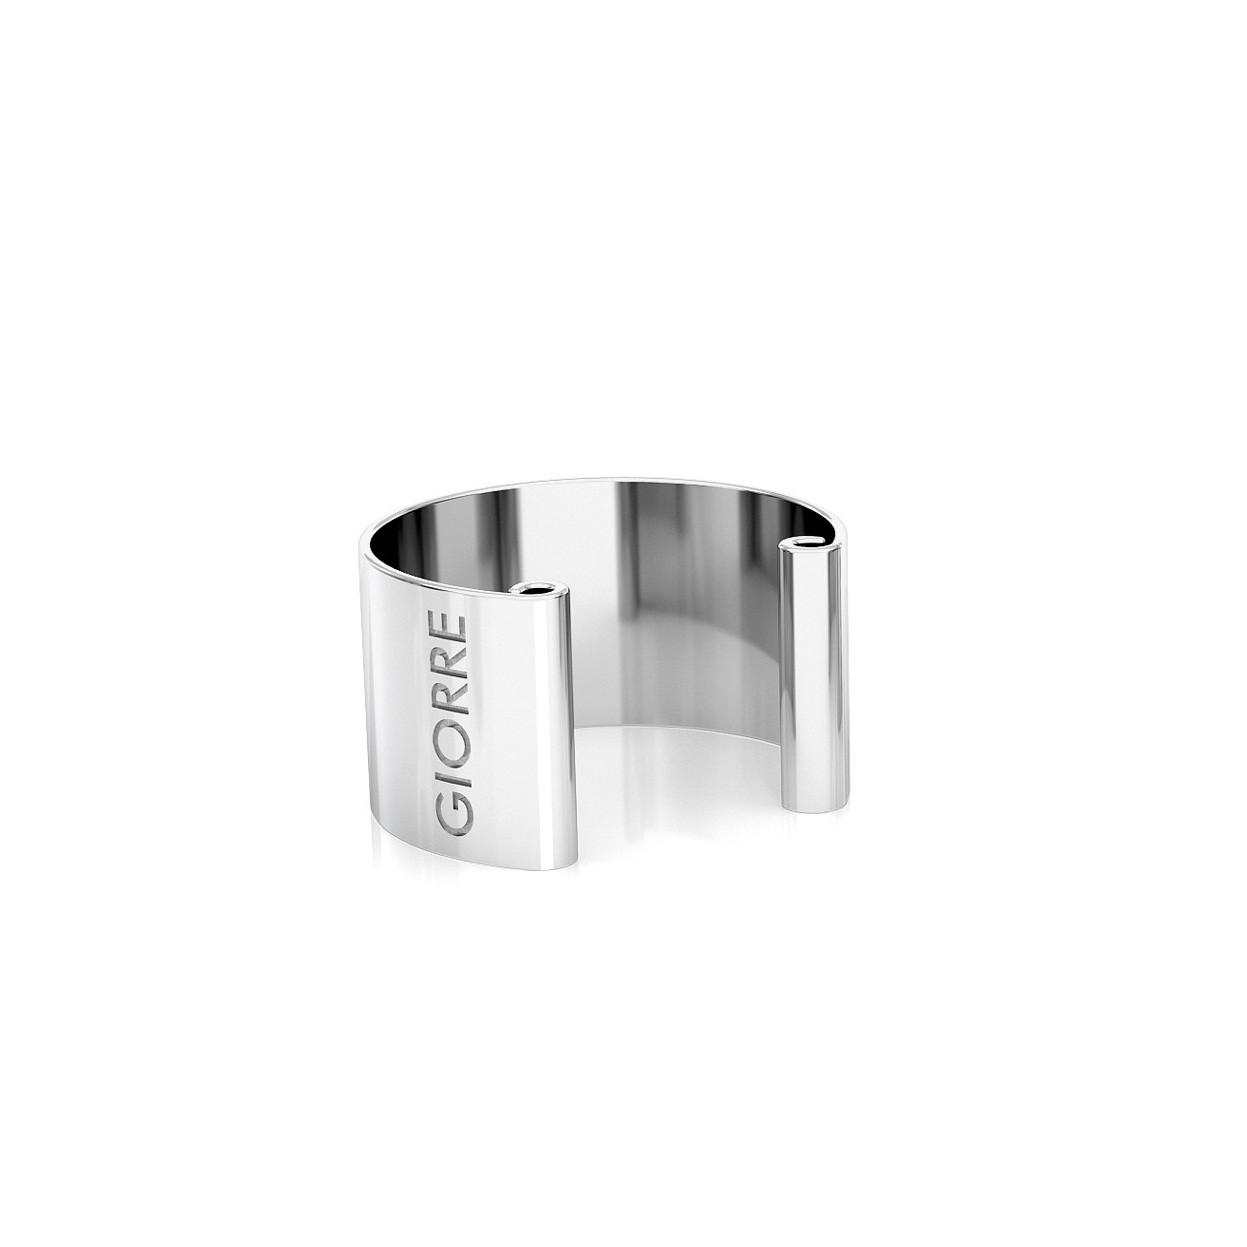 Kolczyk nausznica 0,6 cm, srebro 925